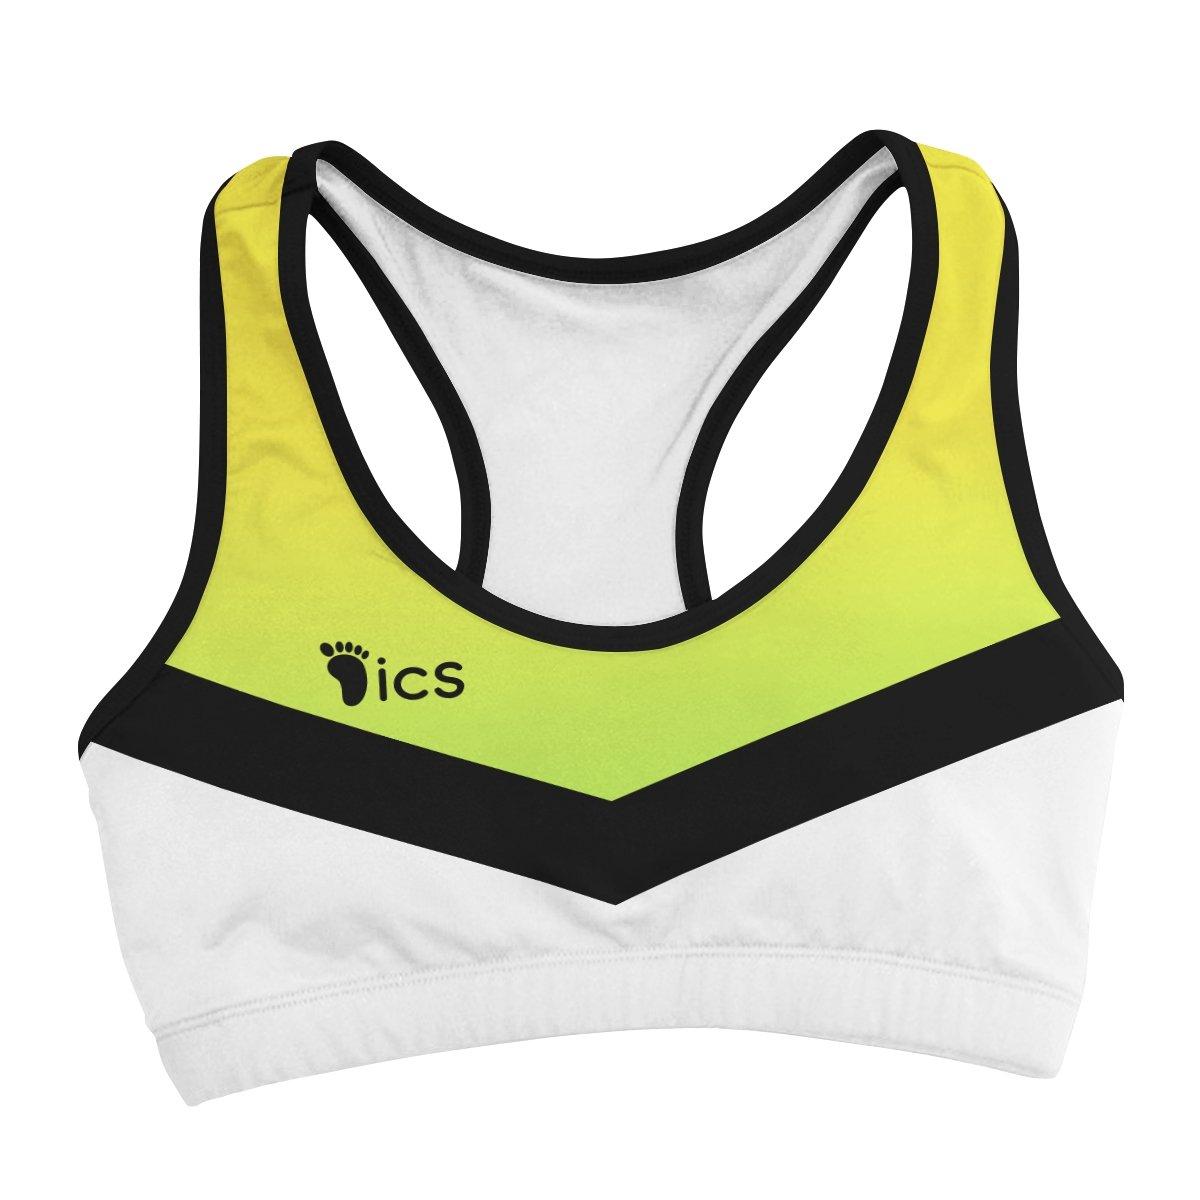 team itachiyama active wear set 971397 - Anime Swimsuits